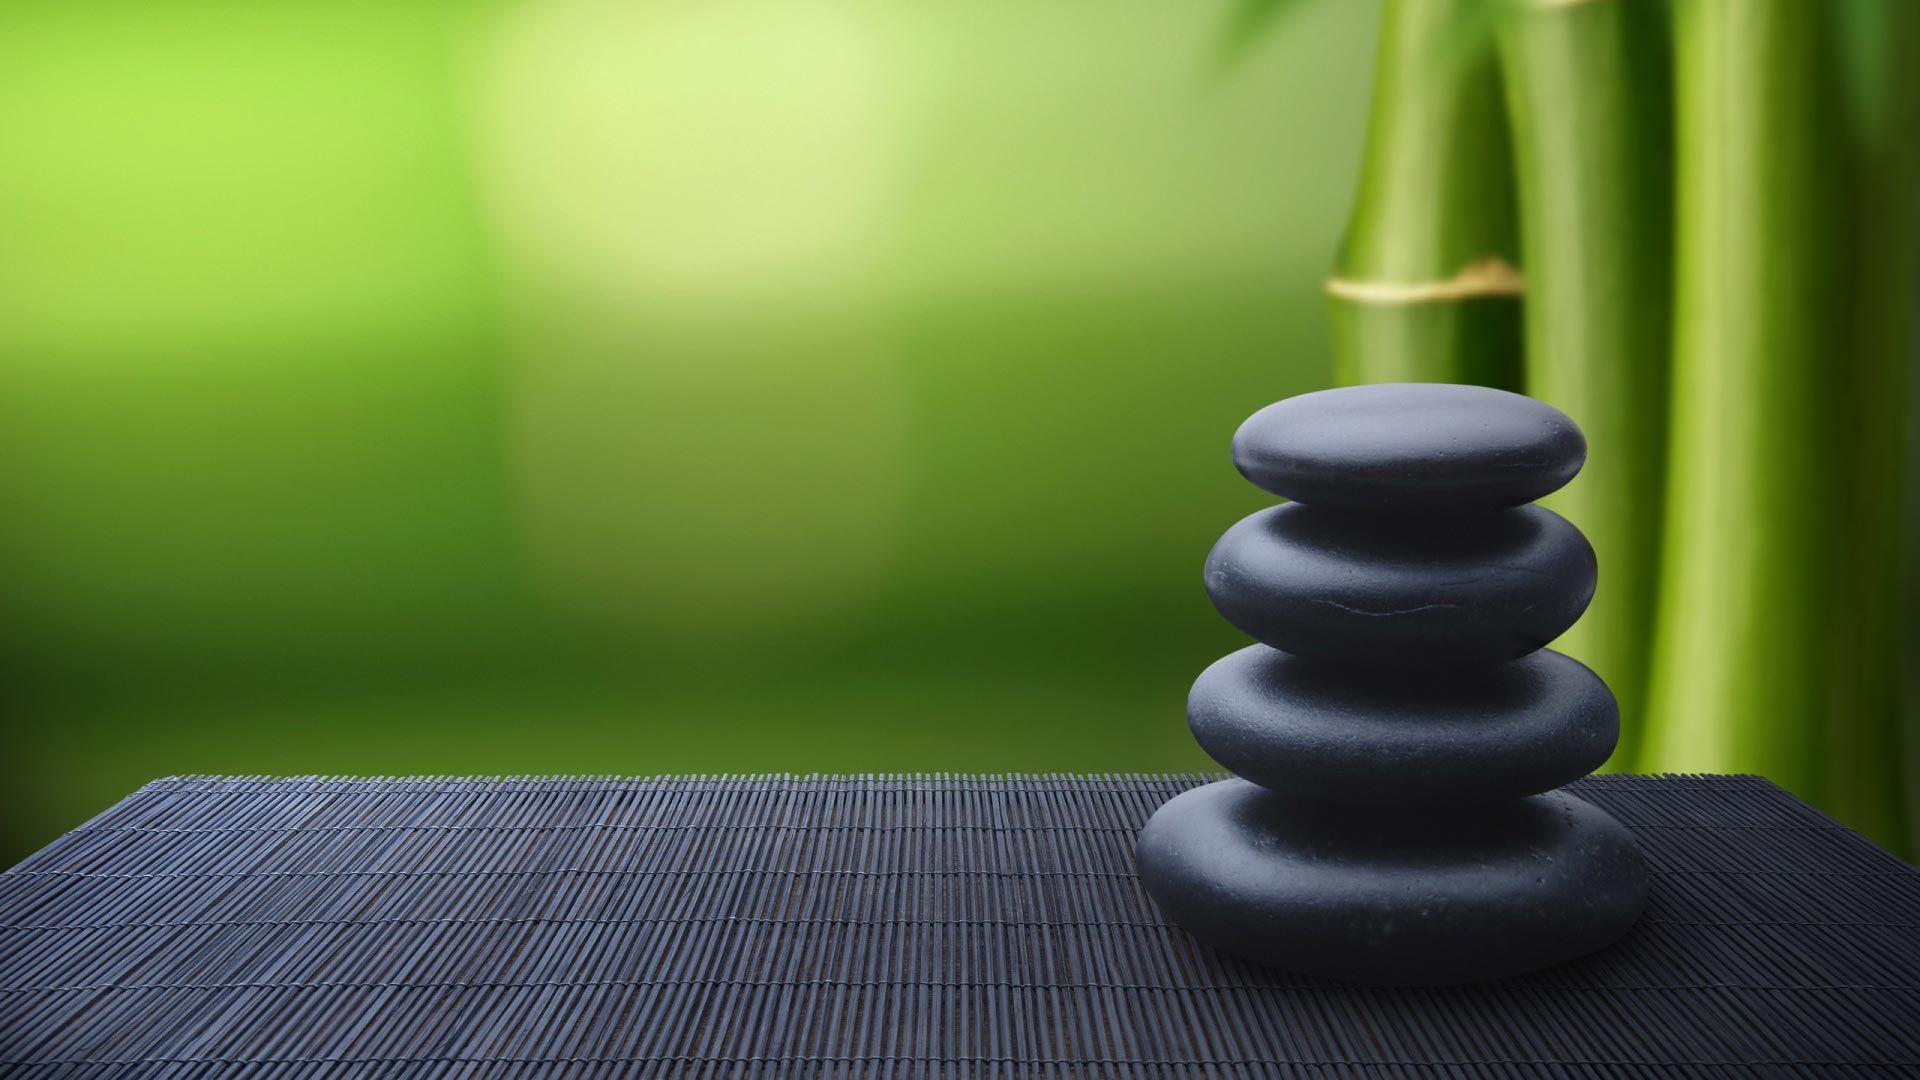 Still Life Photography Theme For Windows 10 8 7 Zen Wallpaper Meditation Stone Wallpaper